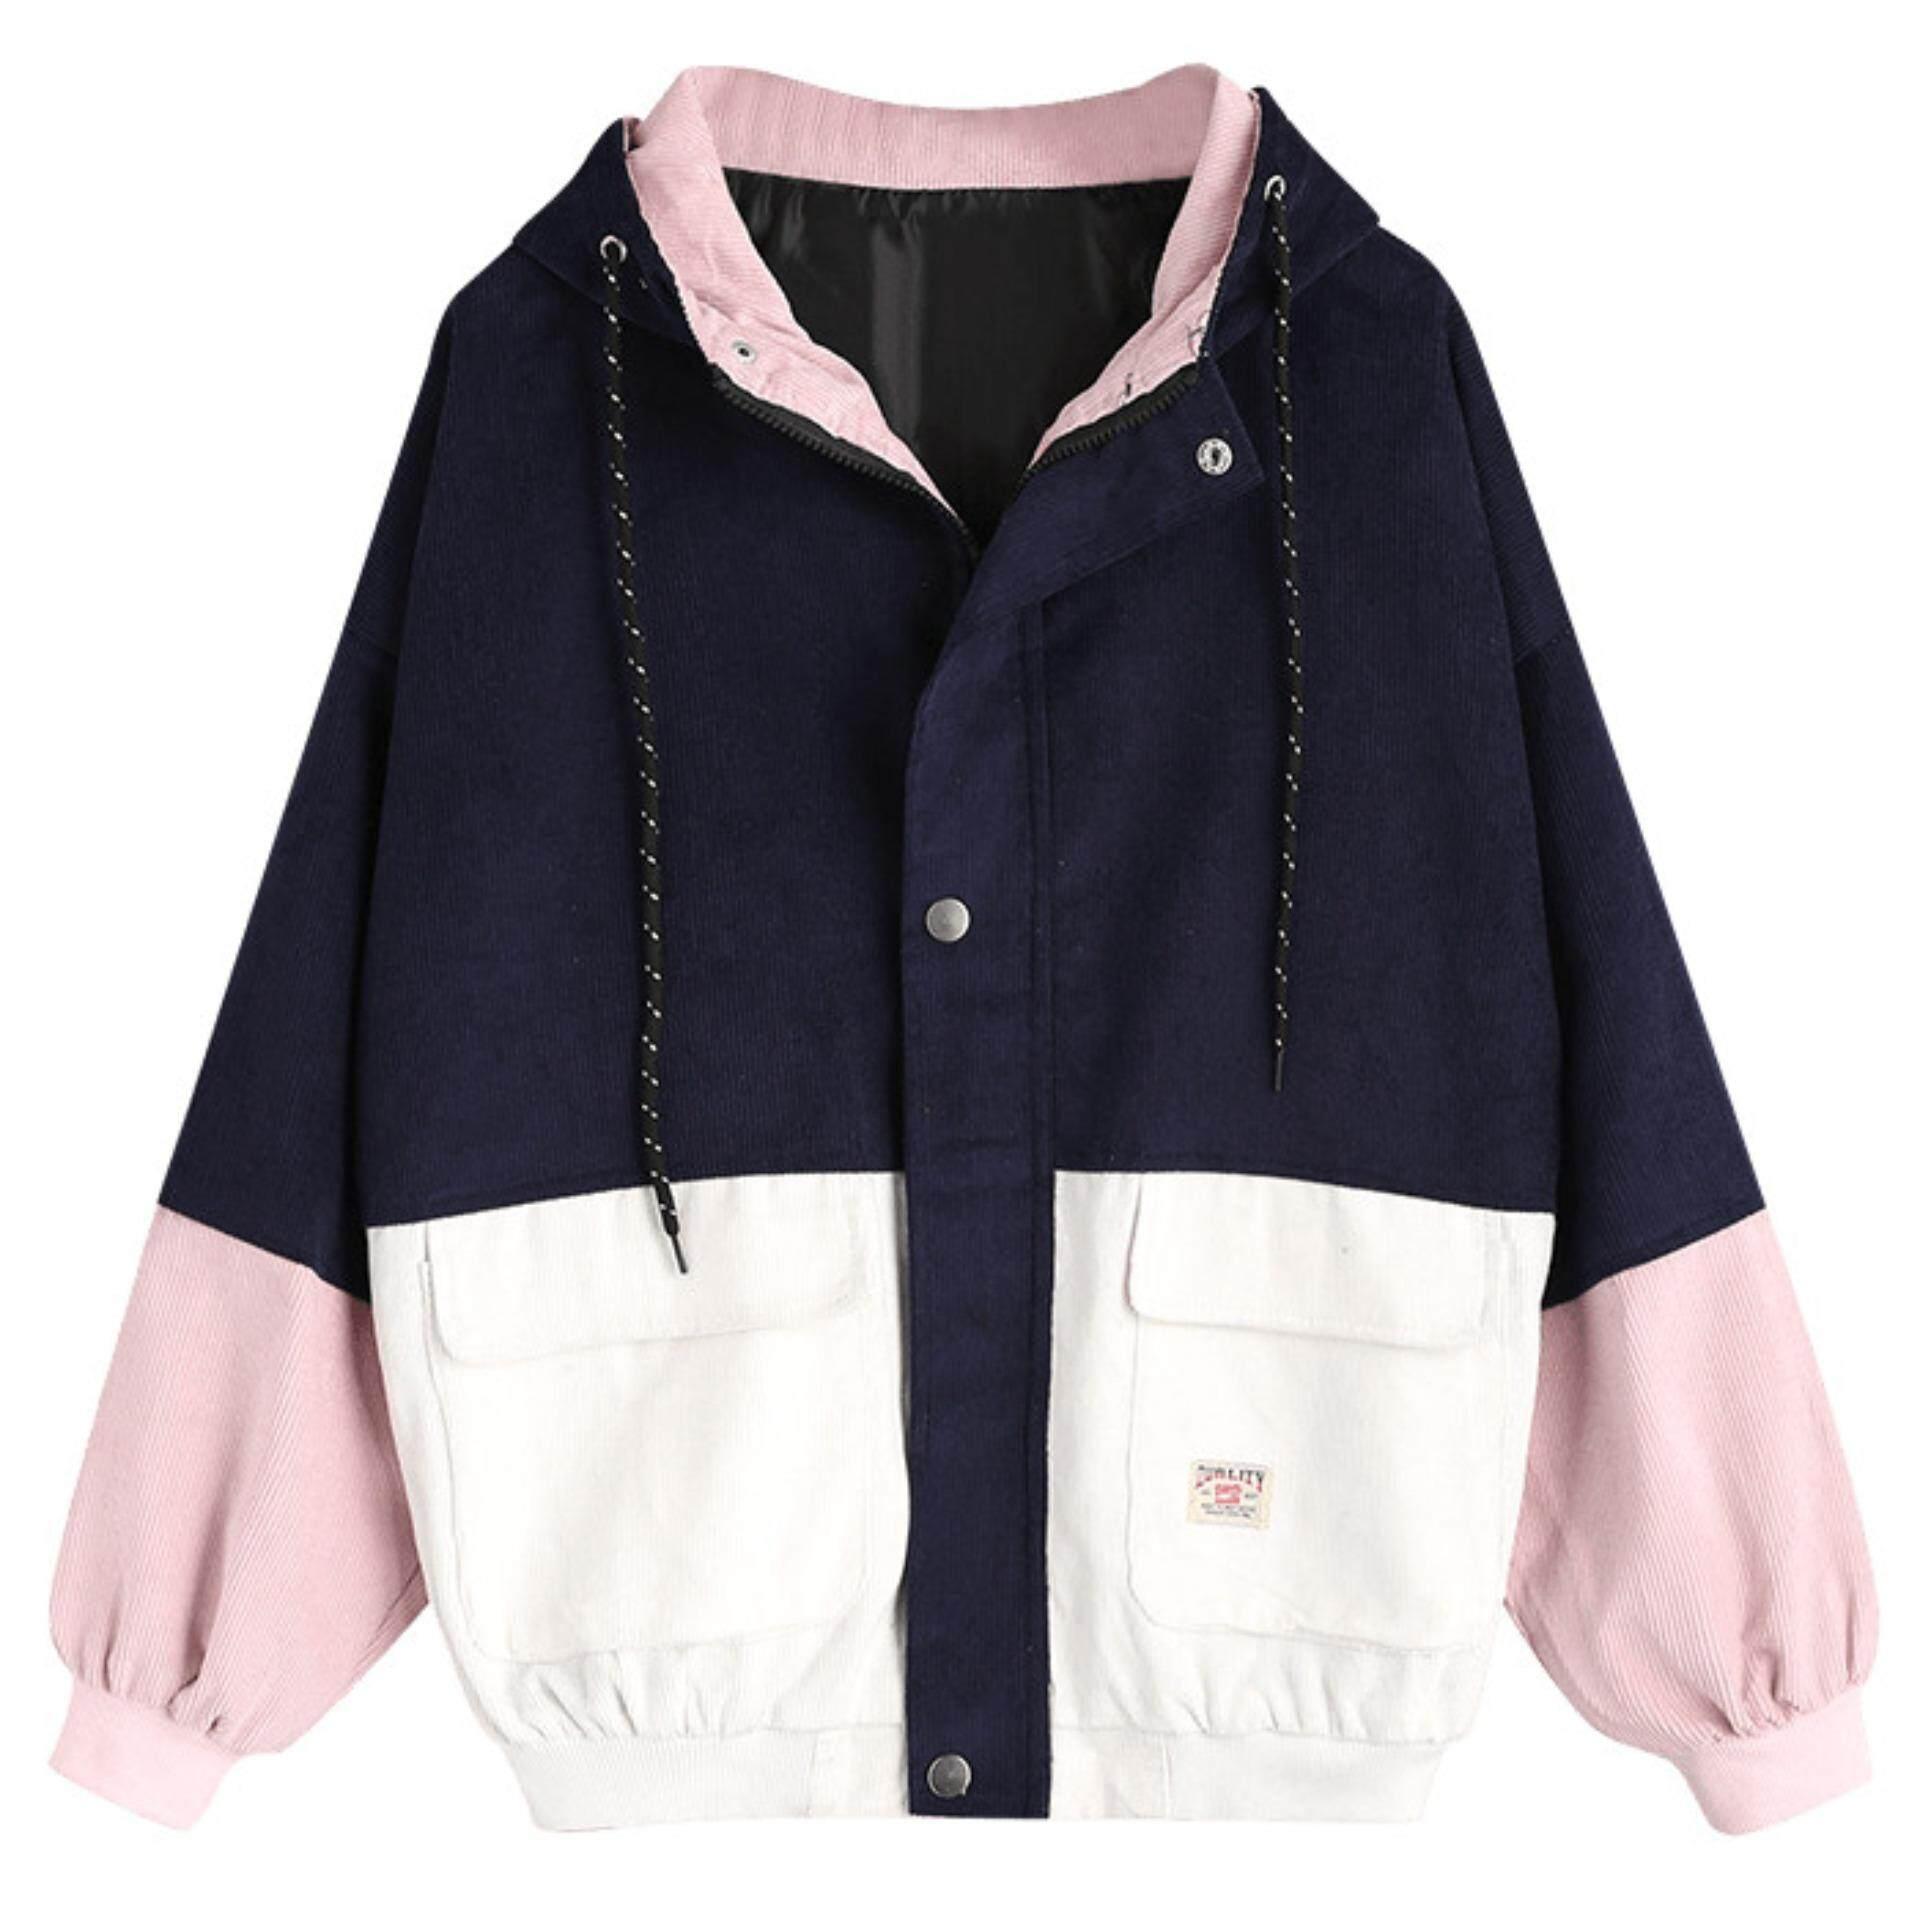 208060ce5 Buy Women Lightweight Jackets in Singapore | Lazada